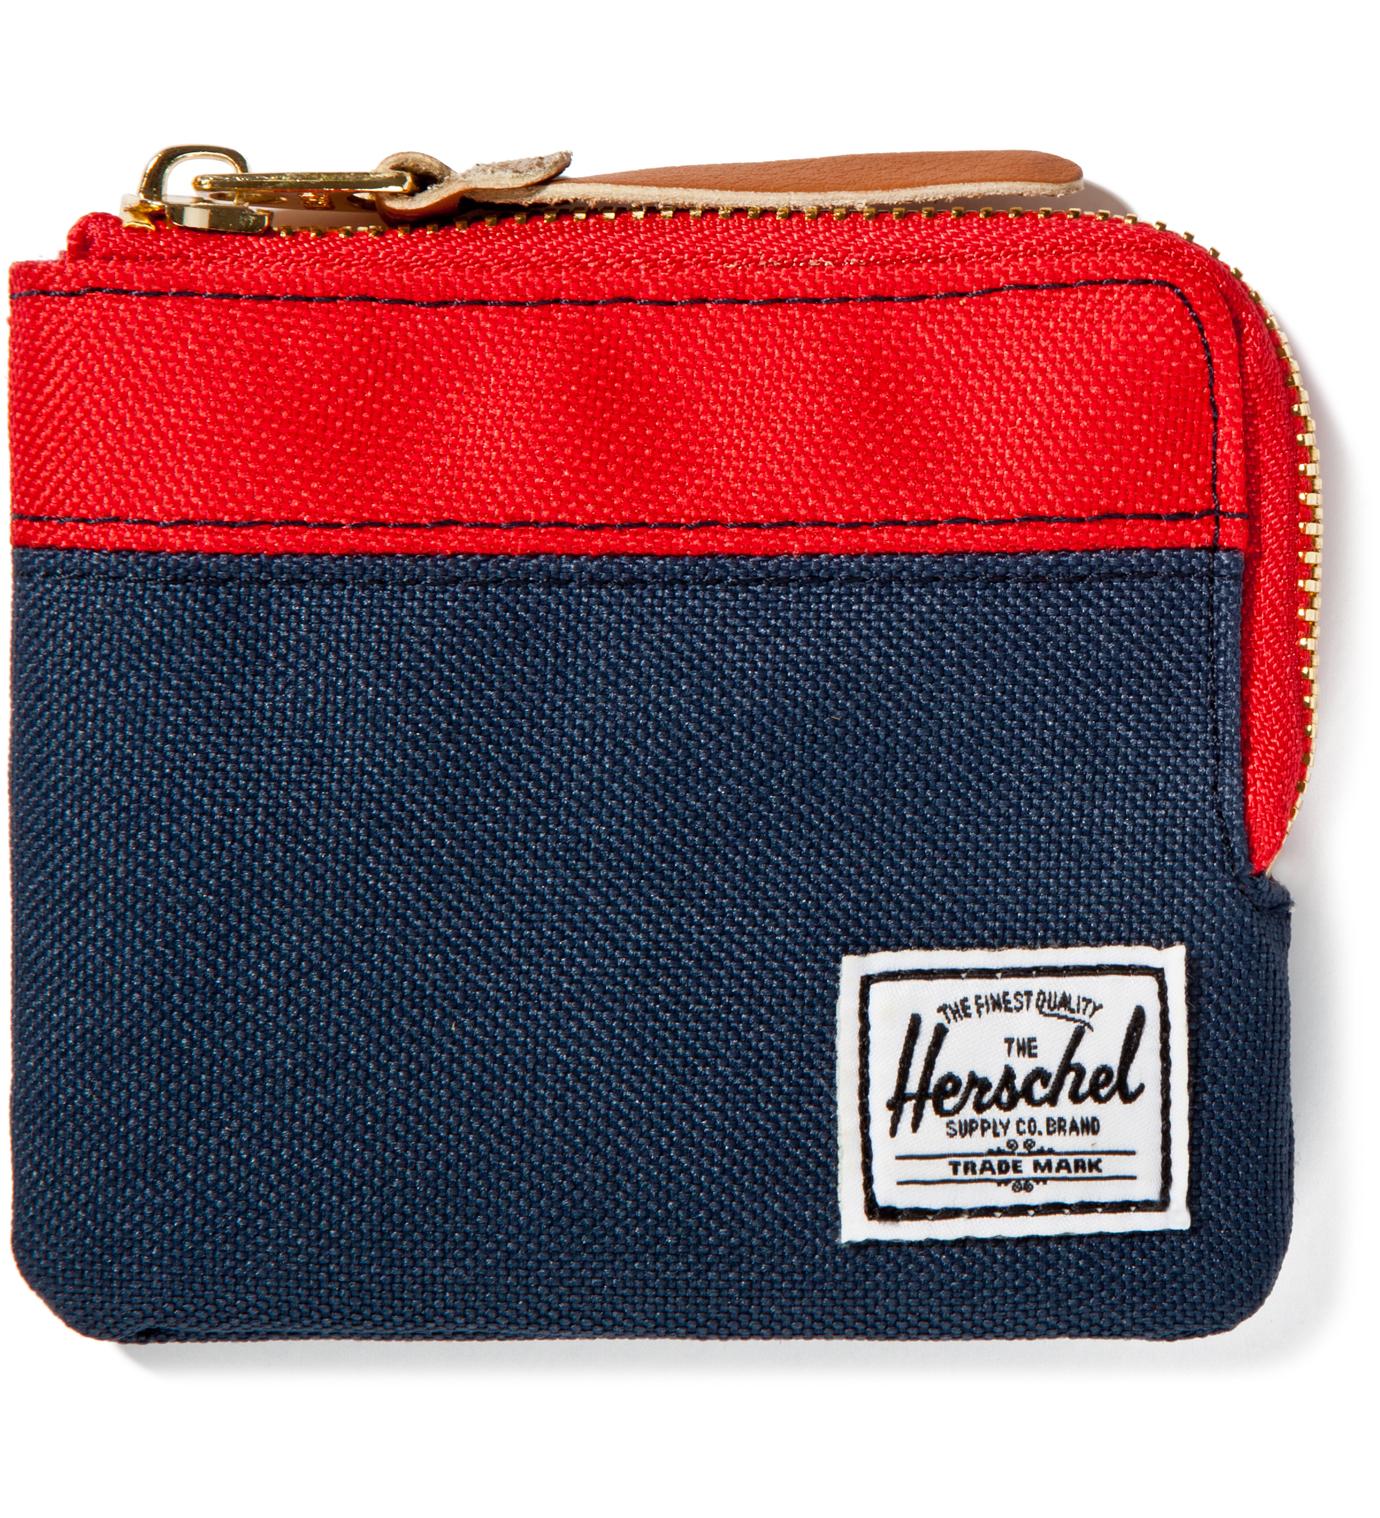 Herschel Supply Co. Red/Navy Johnny Wallet